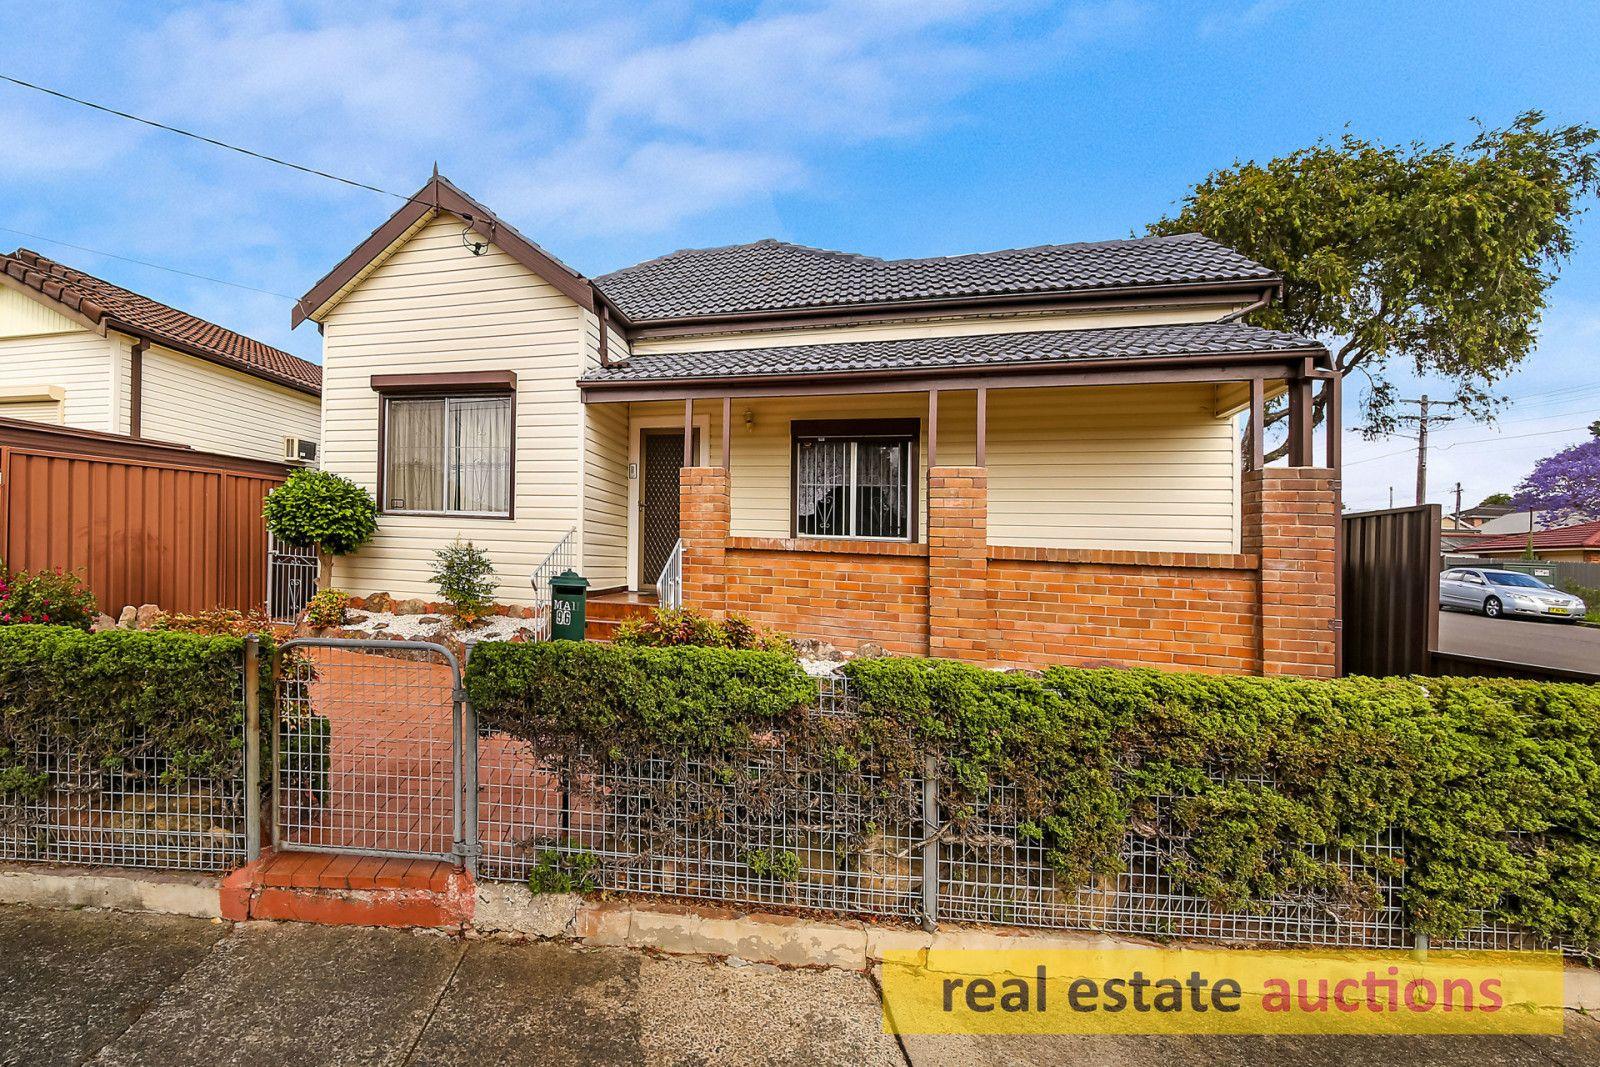 96 DUDLEY STREET, Berala NSW 2141, Image 0